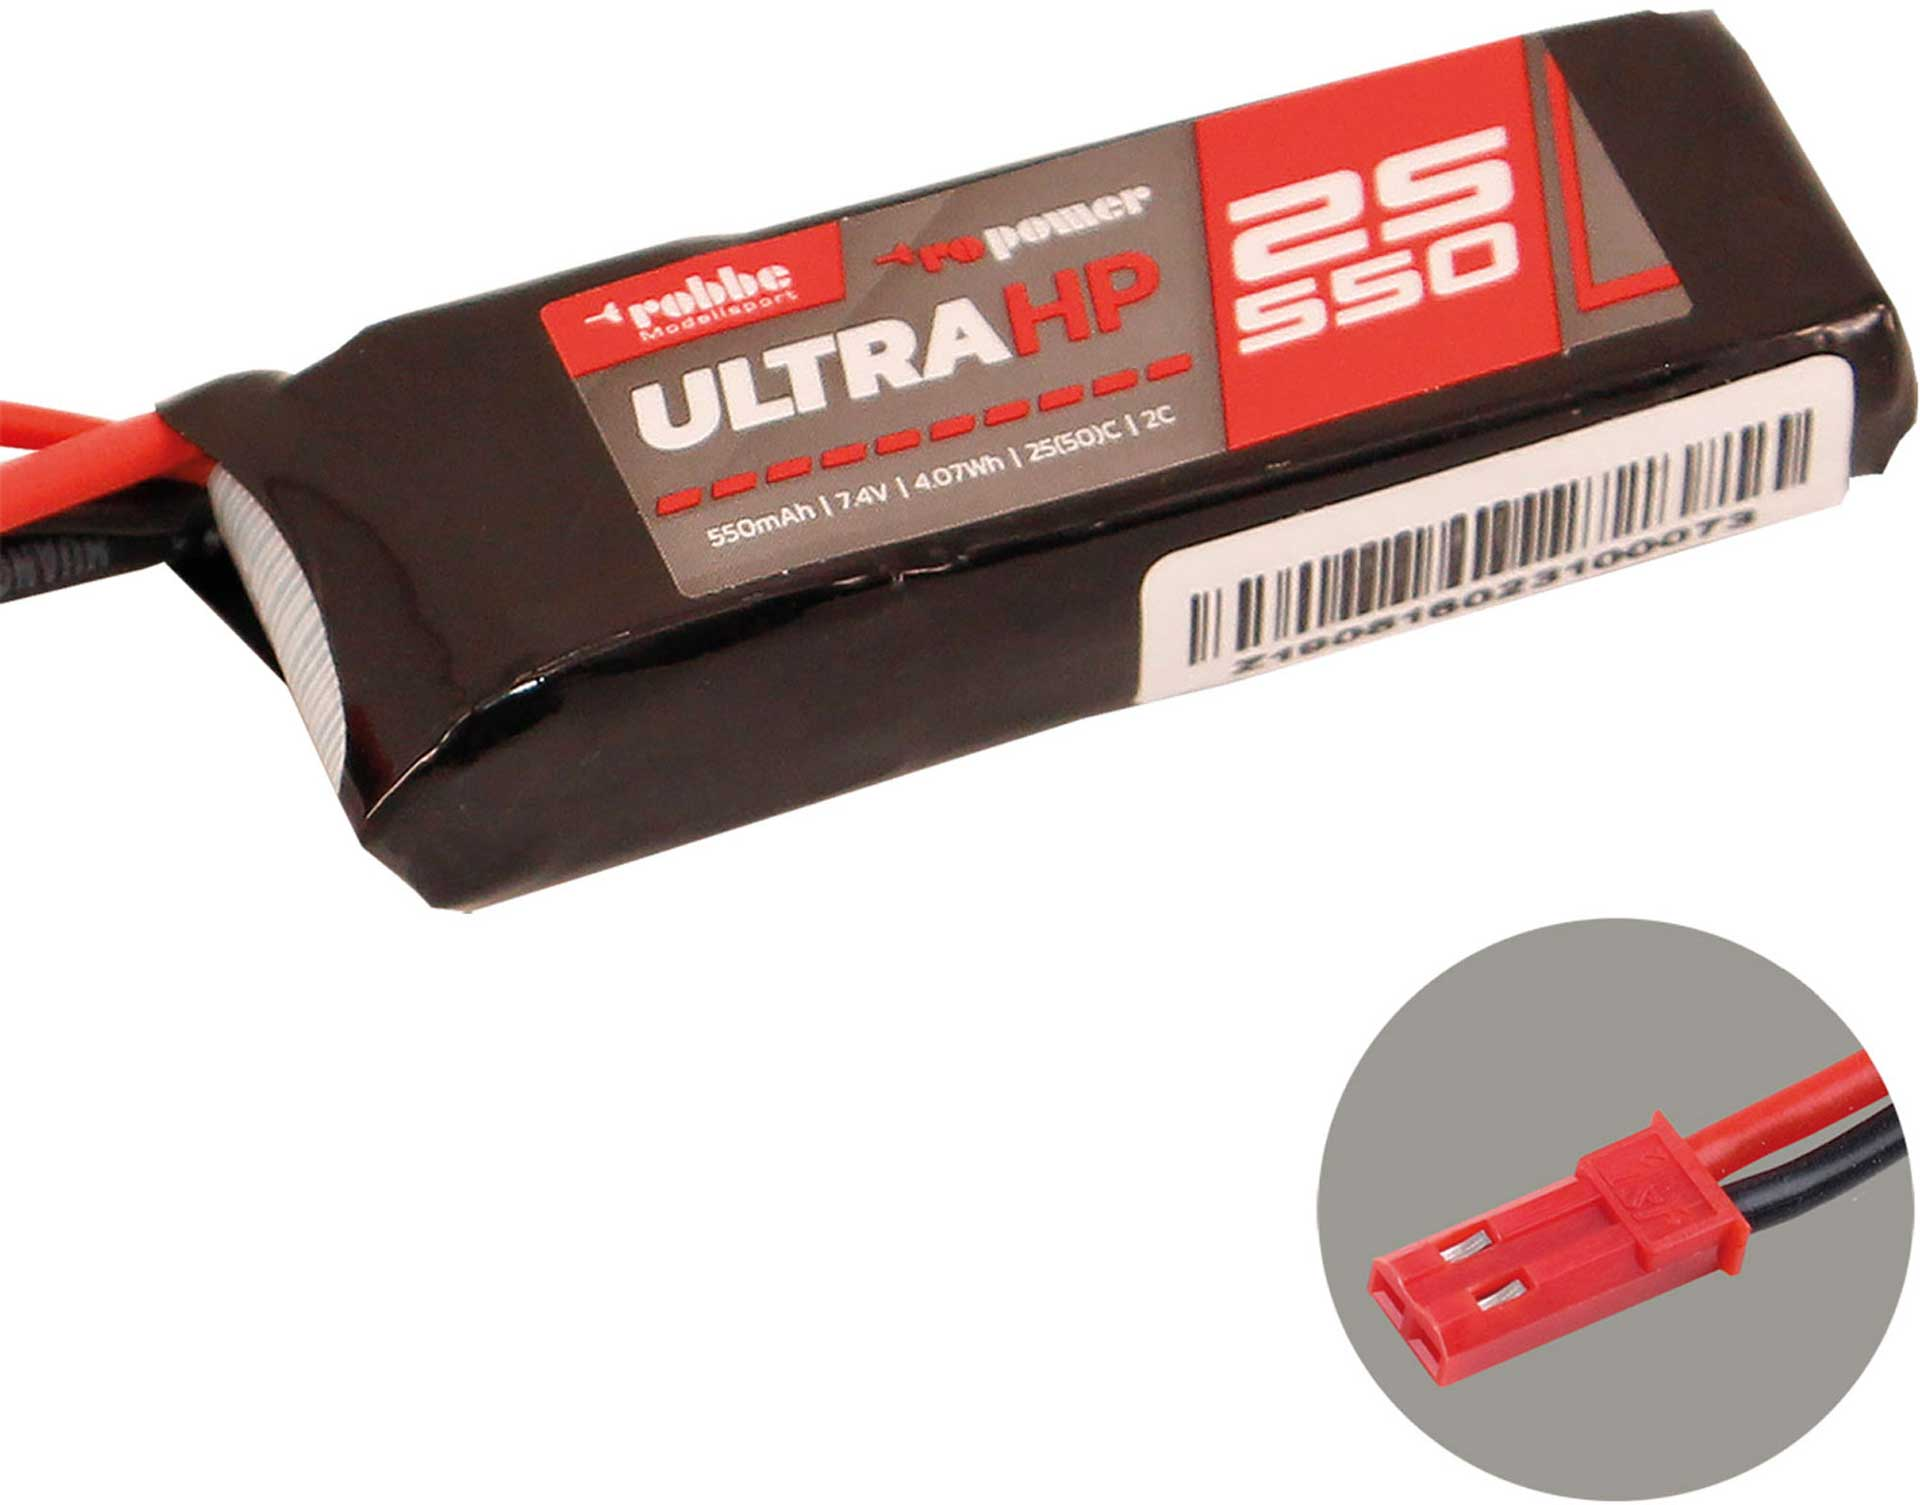 Robbe Modellsport RO-POWER ULTRA HP 550MAH 7,4 VOLT 2S 25(50)C LIPO AKKU